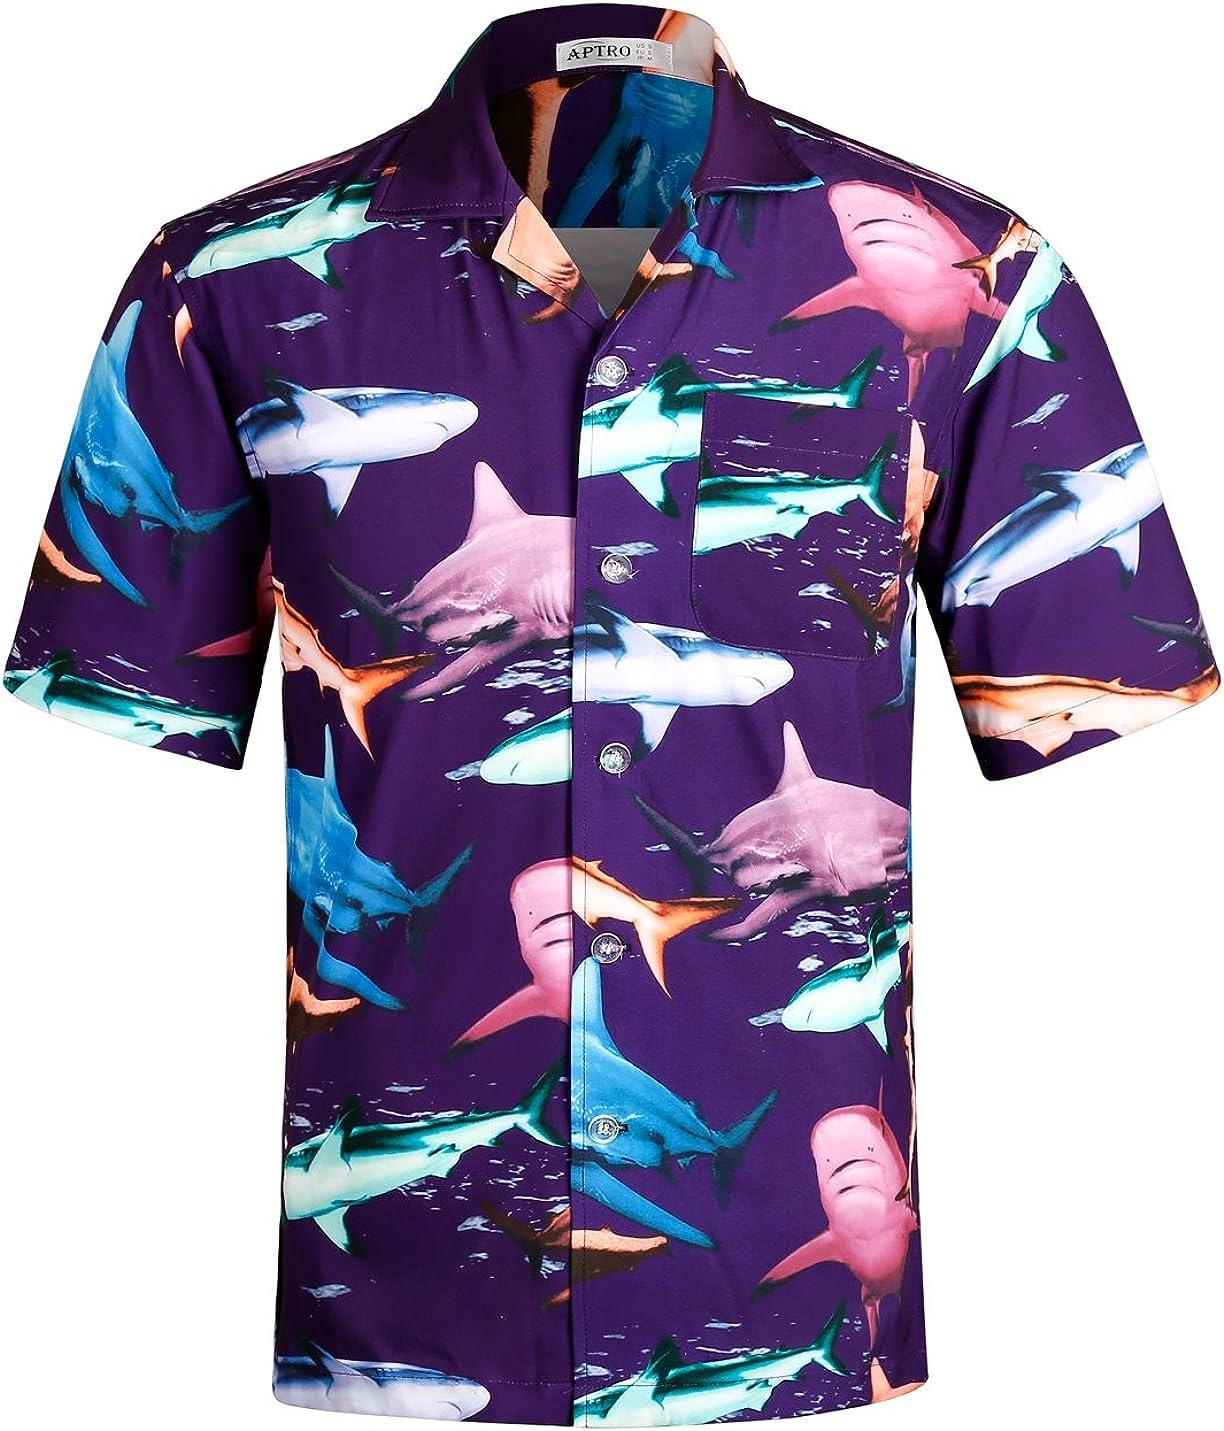 APTRO Men's Casual Hawaiian Shirt 4 Way Stretch Relax Fit Short Sleeve Tropical Shirts